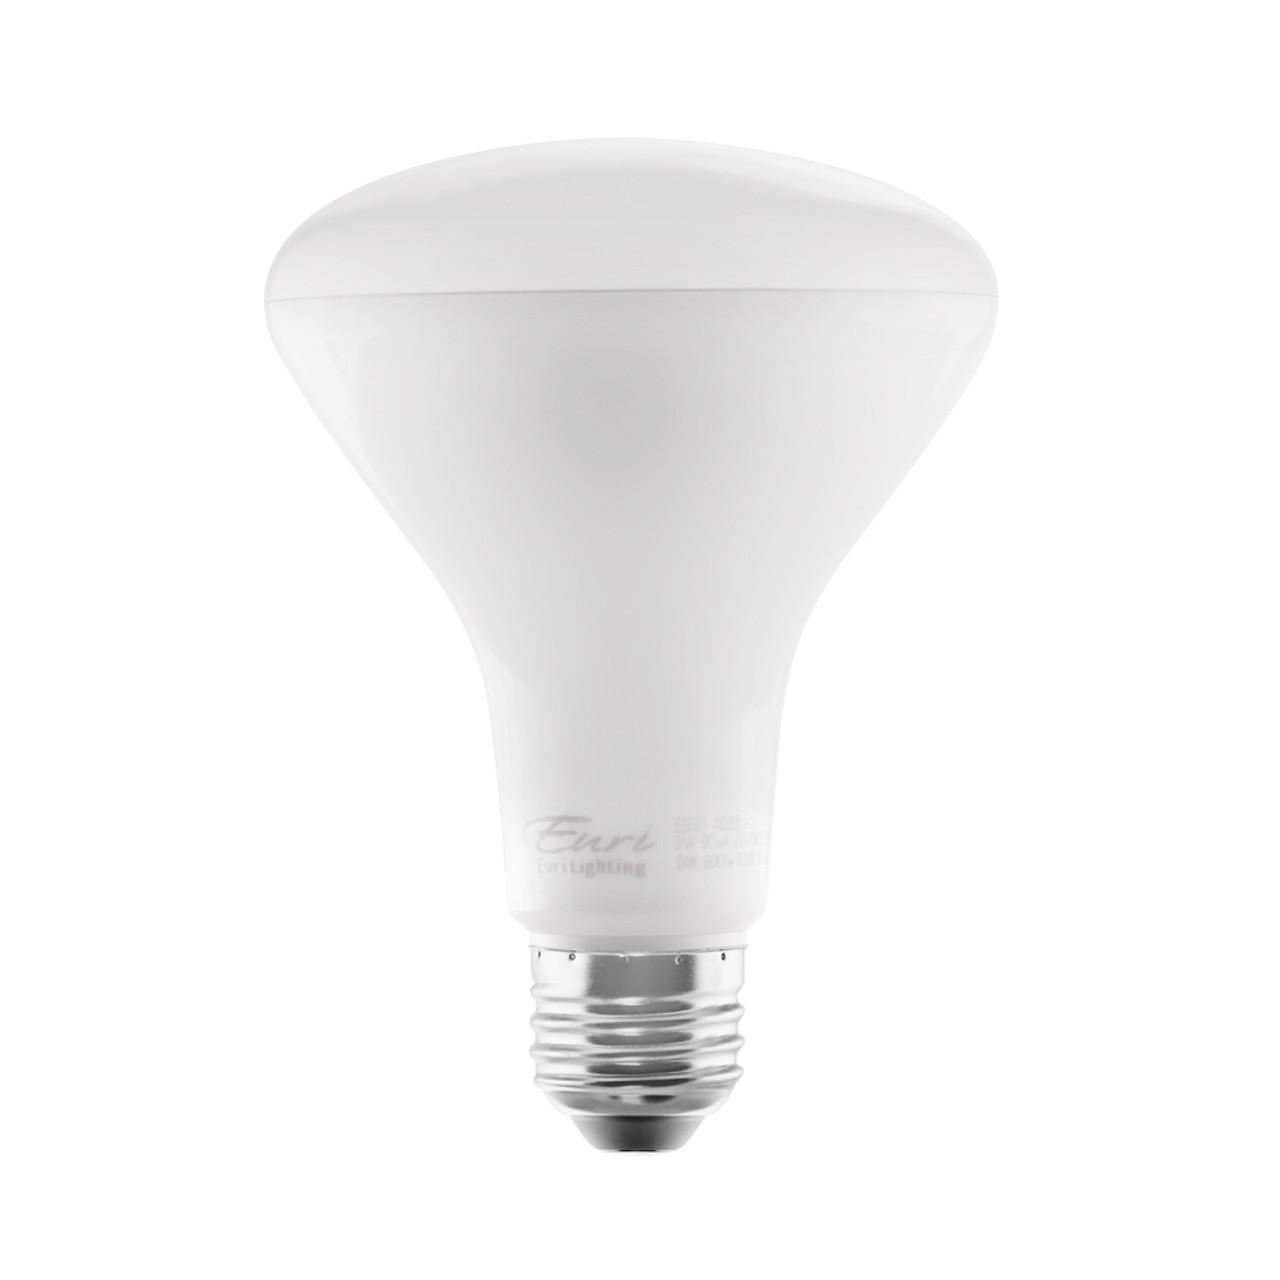 BR30, Directional (Flood), LED Light Bulb, Dimmable, 9 W, 120 V, 800 lm, 3000 K, E26 Base (EB30-5000cec)